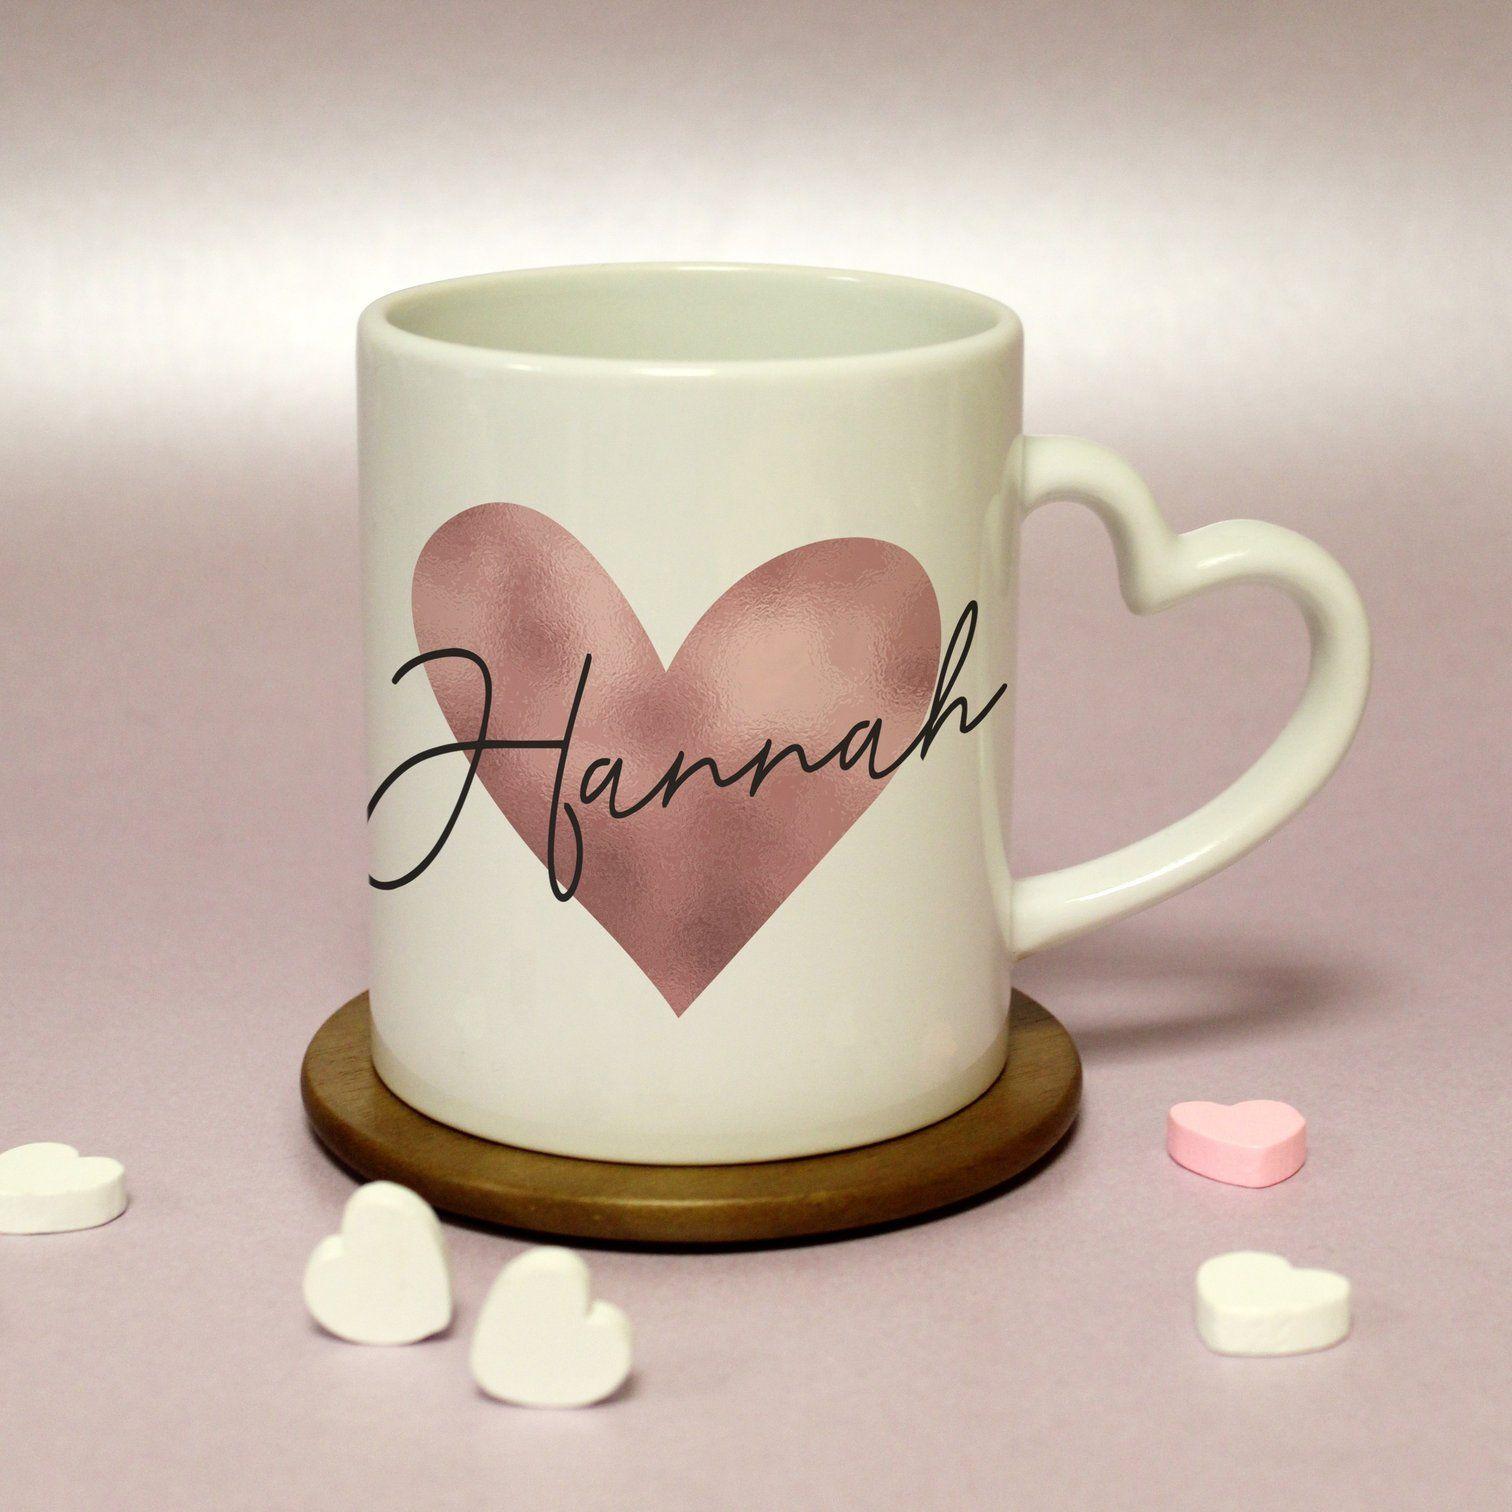 Personalised Rose Gold Heart Handled Mug Valentine